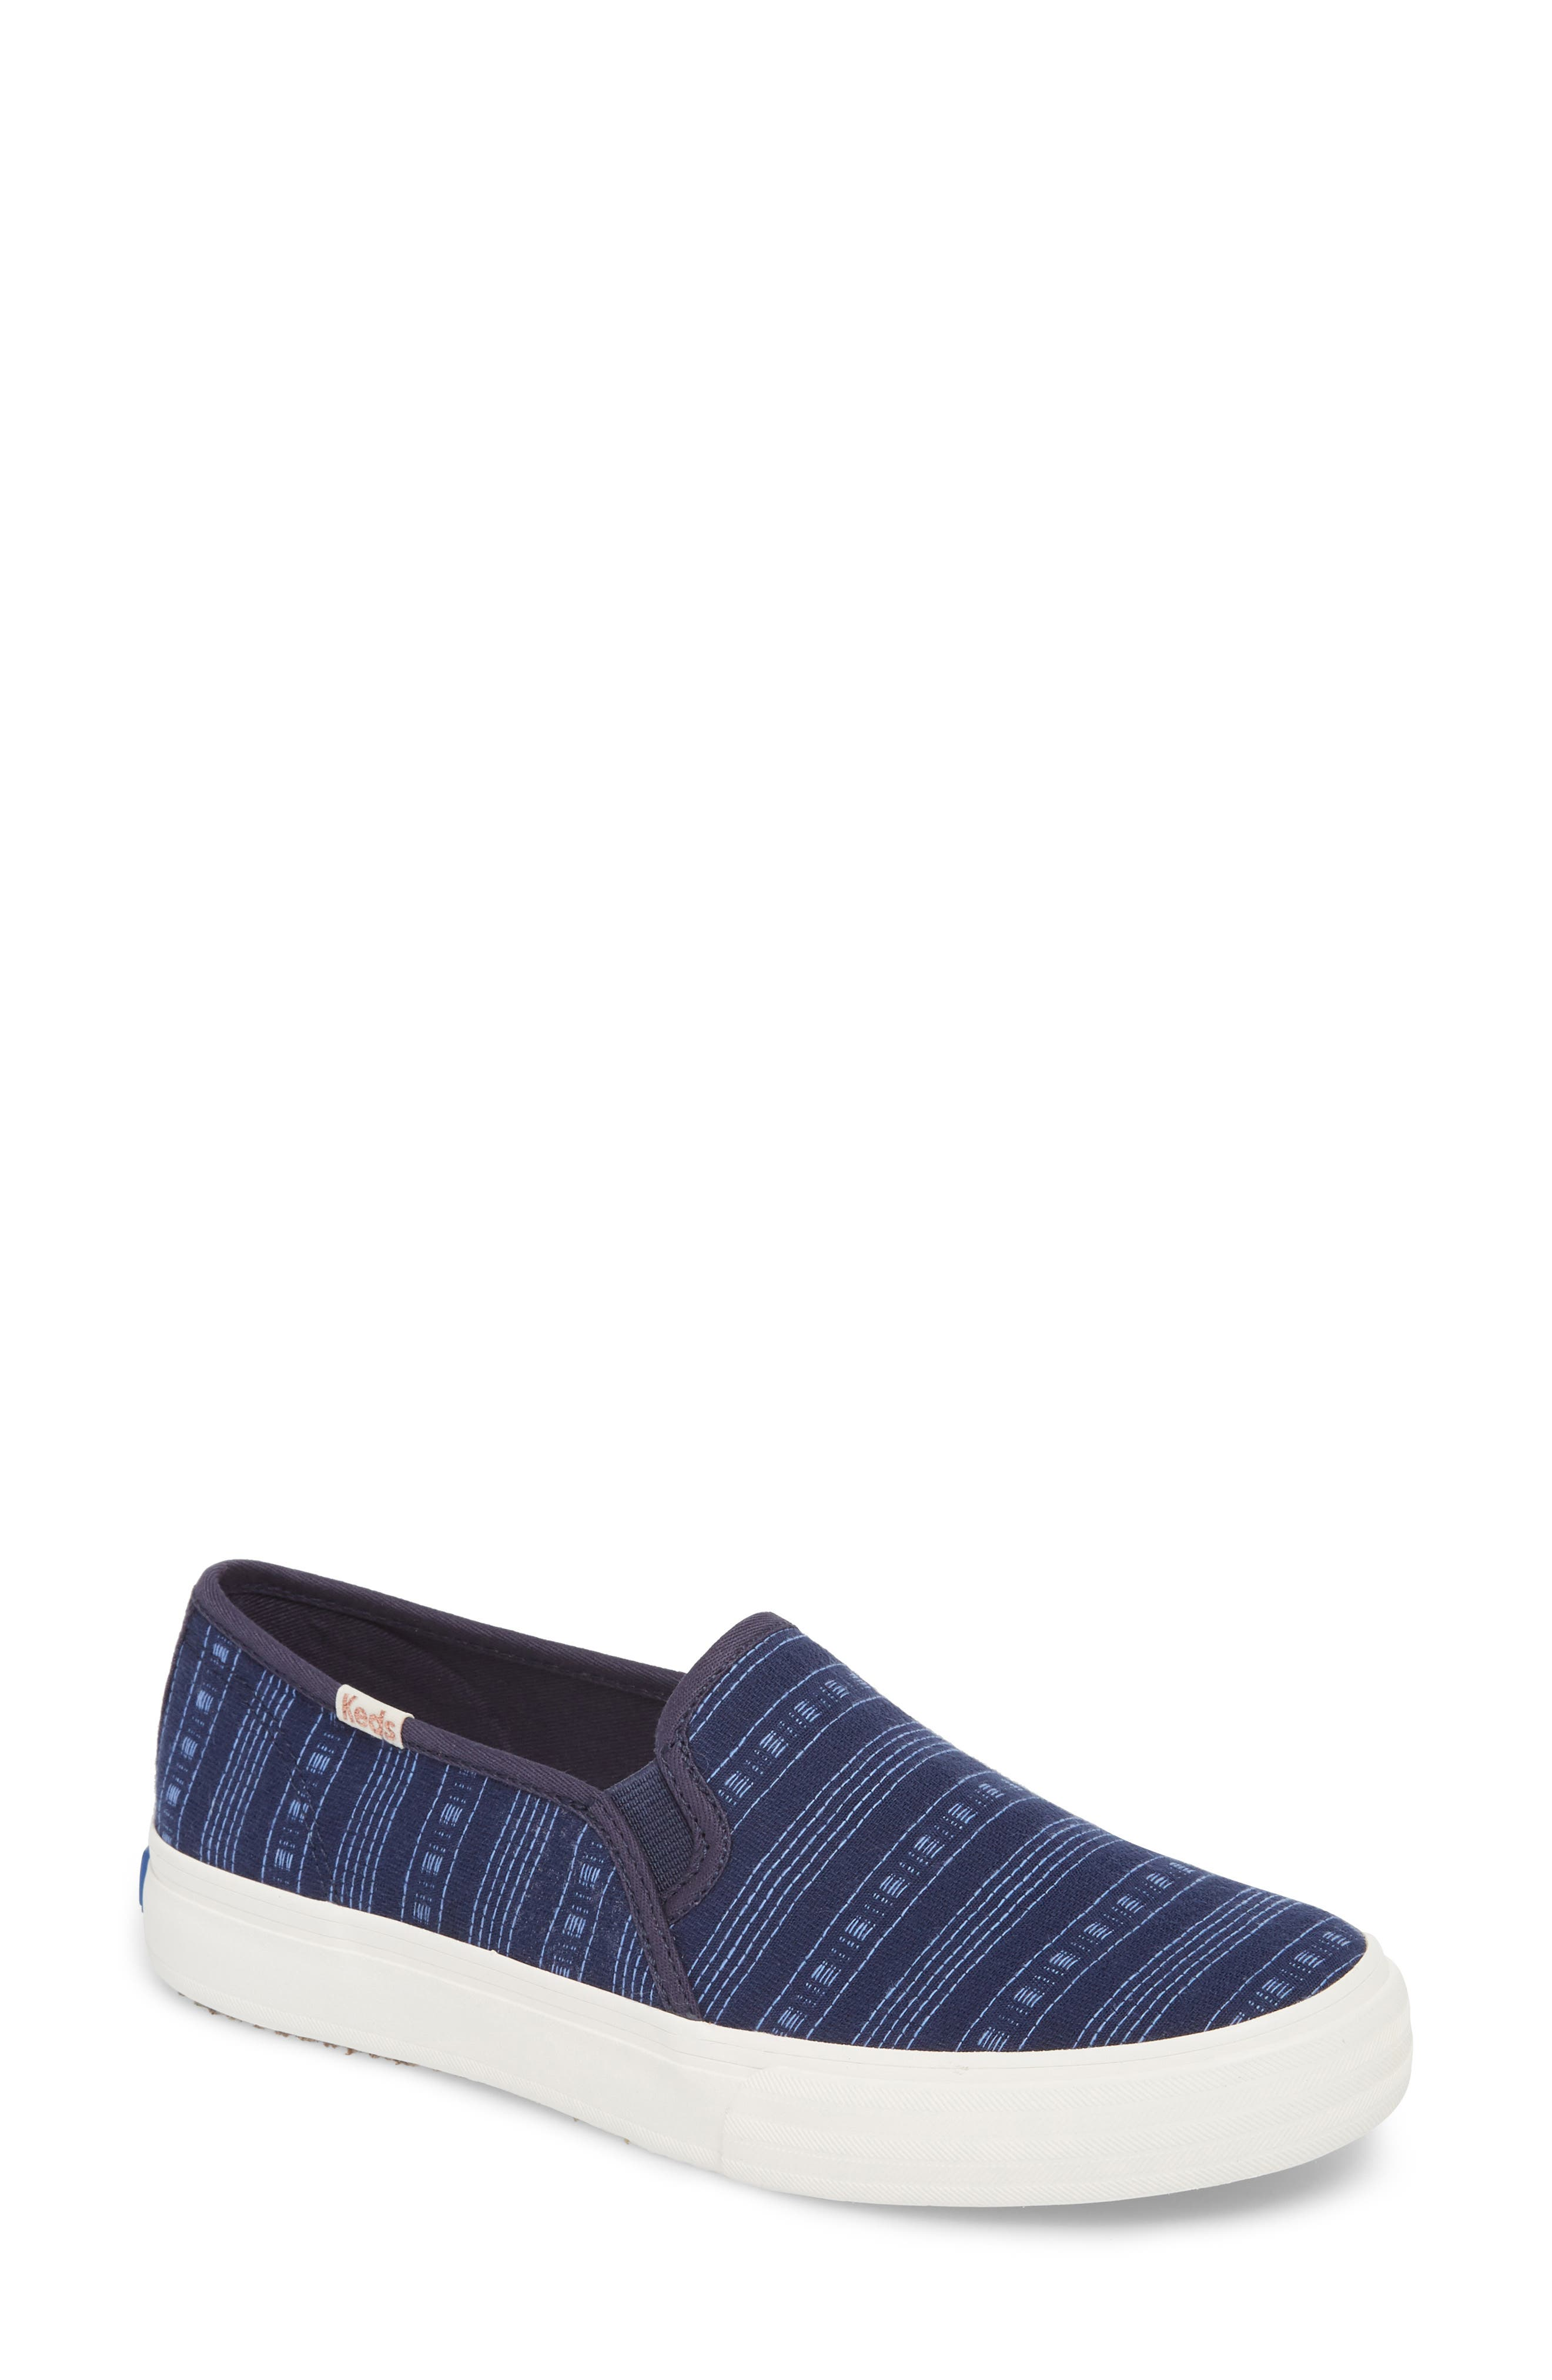 Double Decker Summer Stripe Slip-On Sneaker,                         Main,                         color, 410